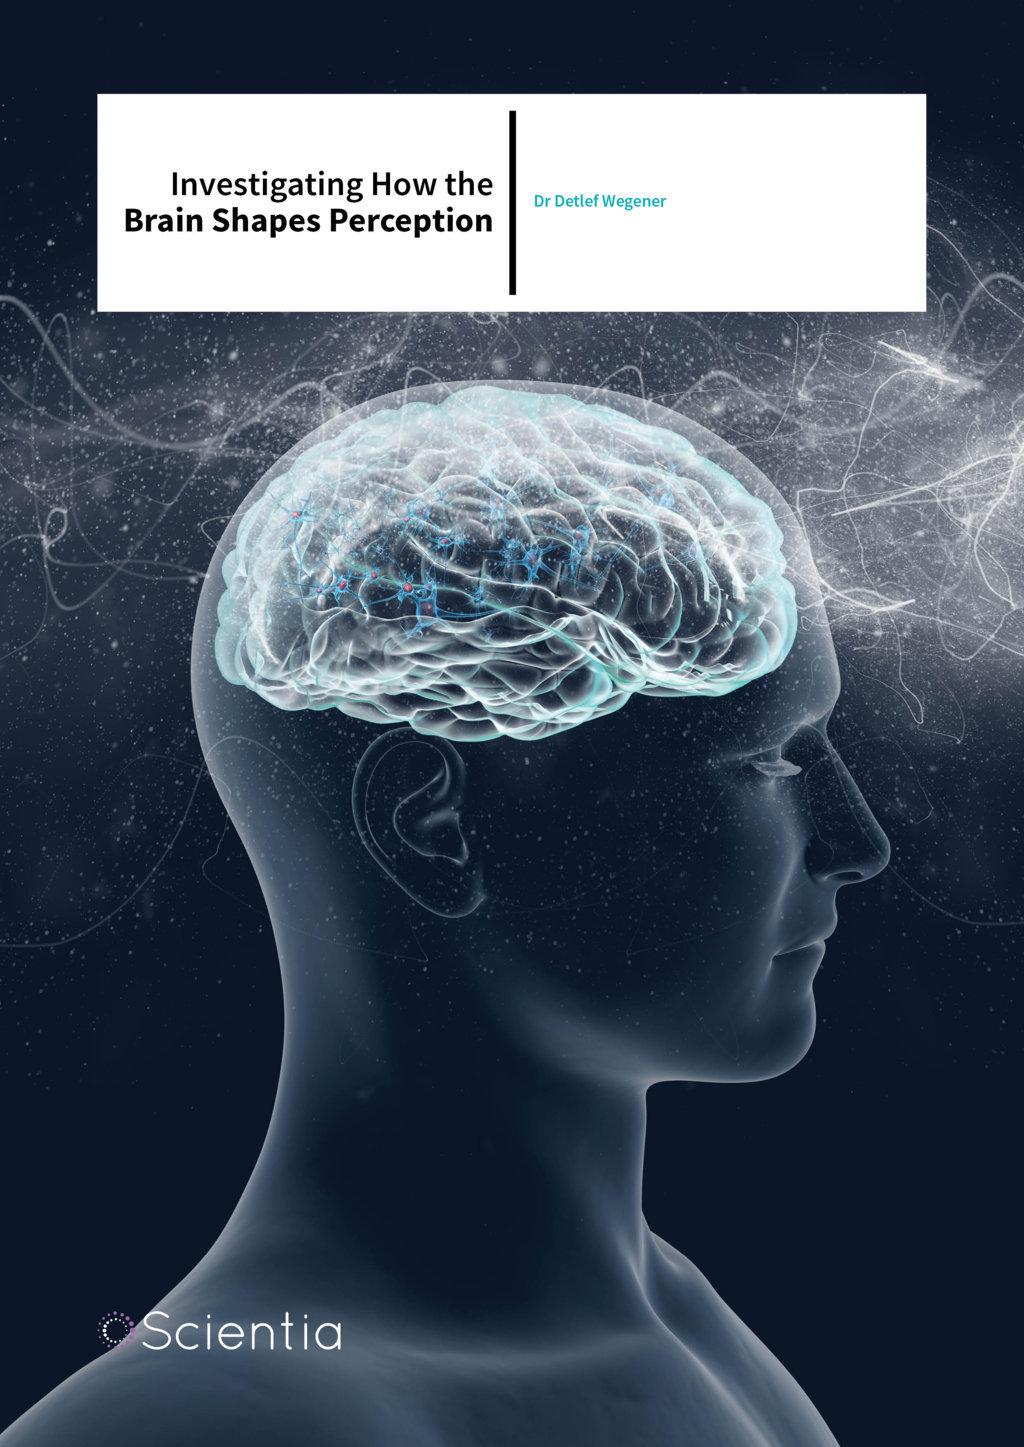 Dr Detlef Wegener – Investigating How The Brain Shapes Perception